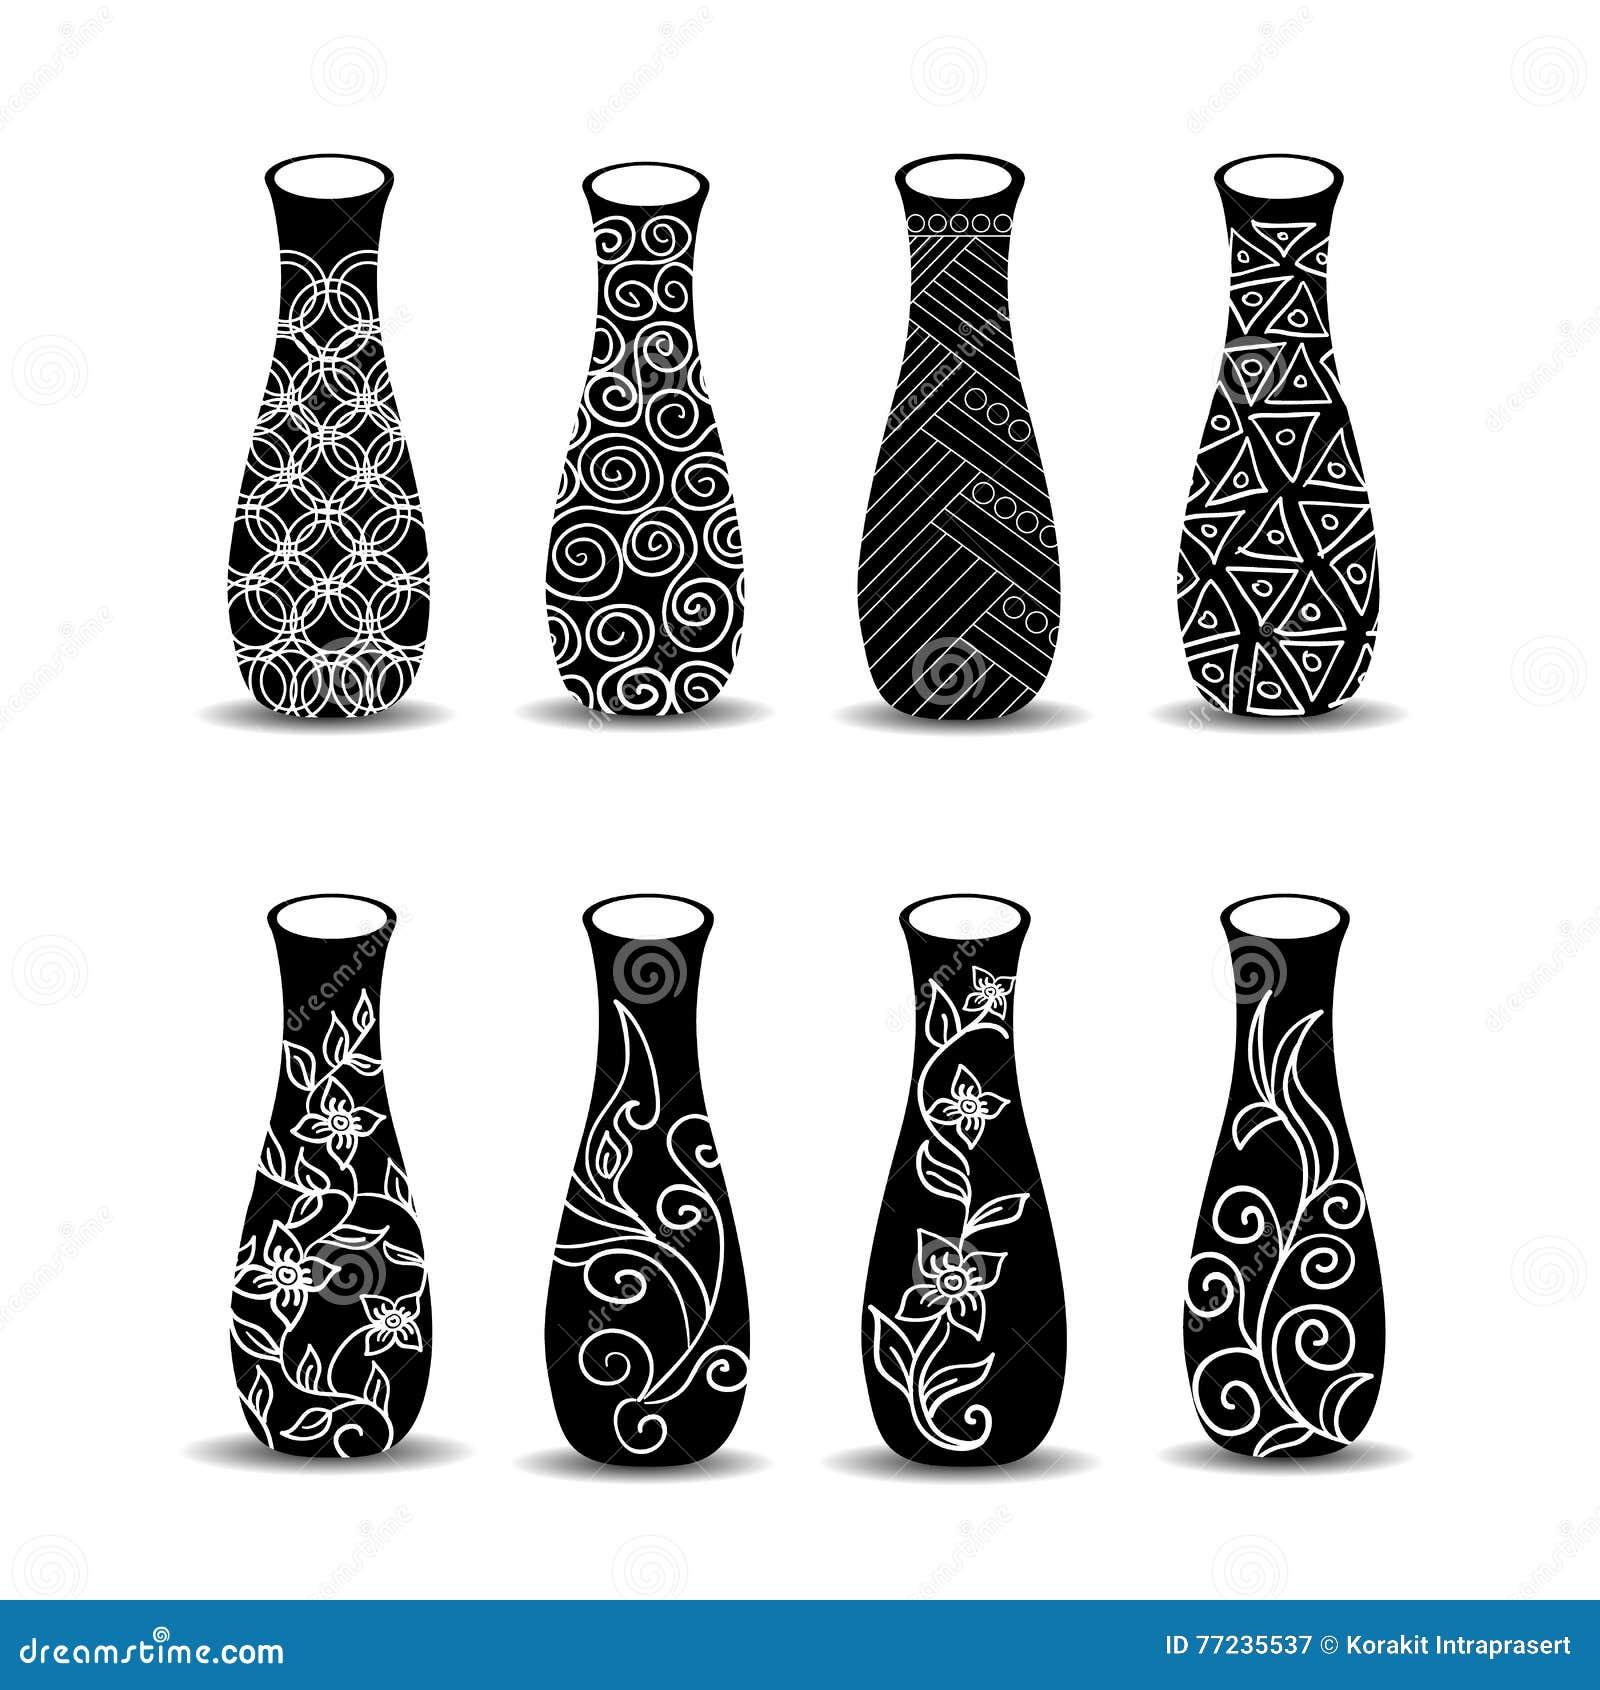 Vase Set. Pottery Vases Flower Home Interior Decoration